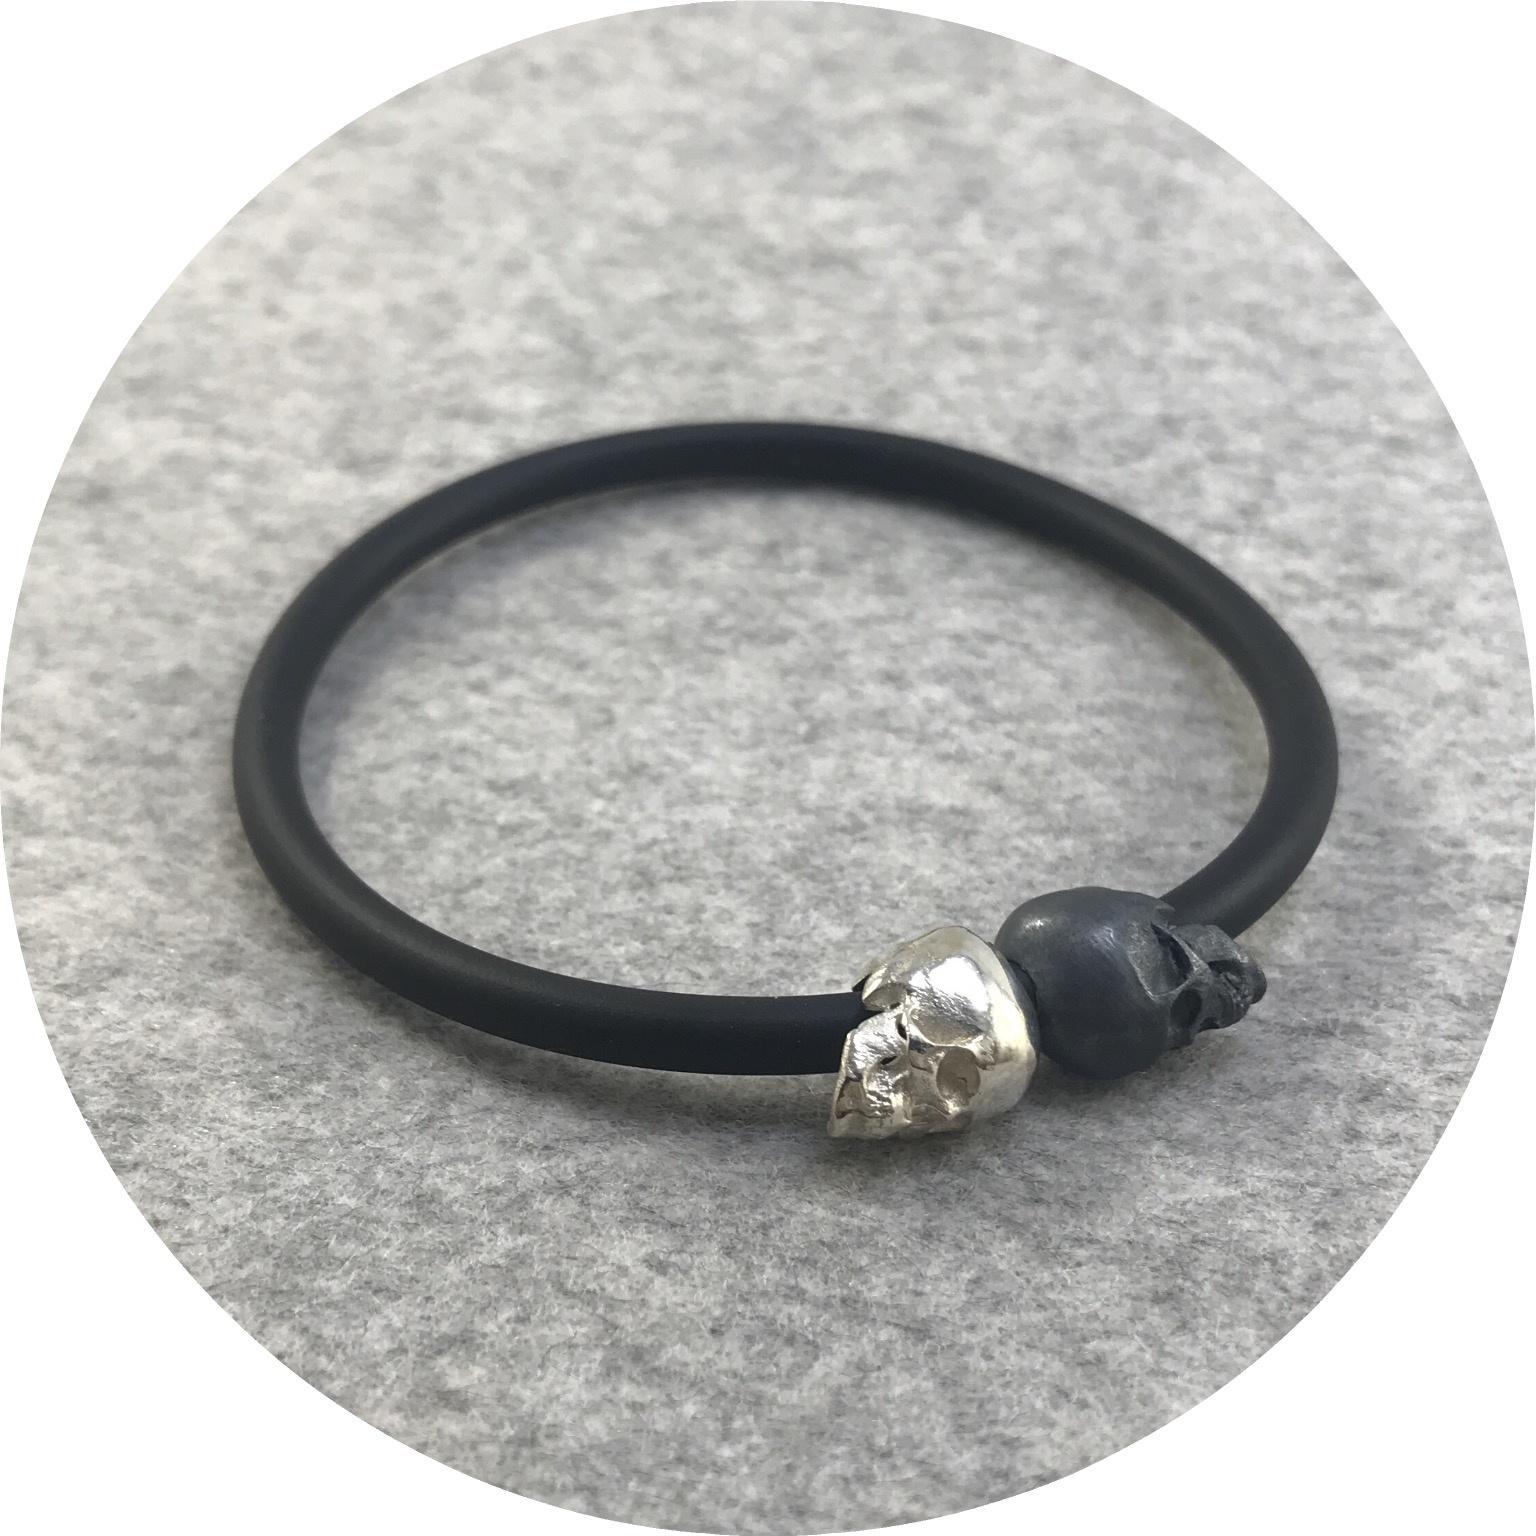 Fin Mahon - Two Skull Bracelet in Sterling Silver and Neoprene